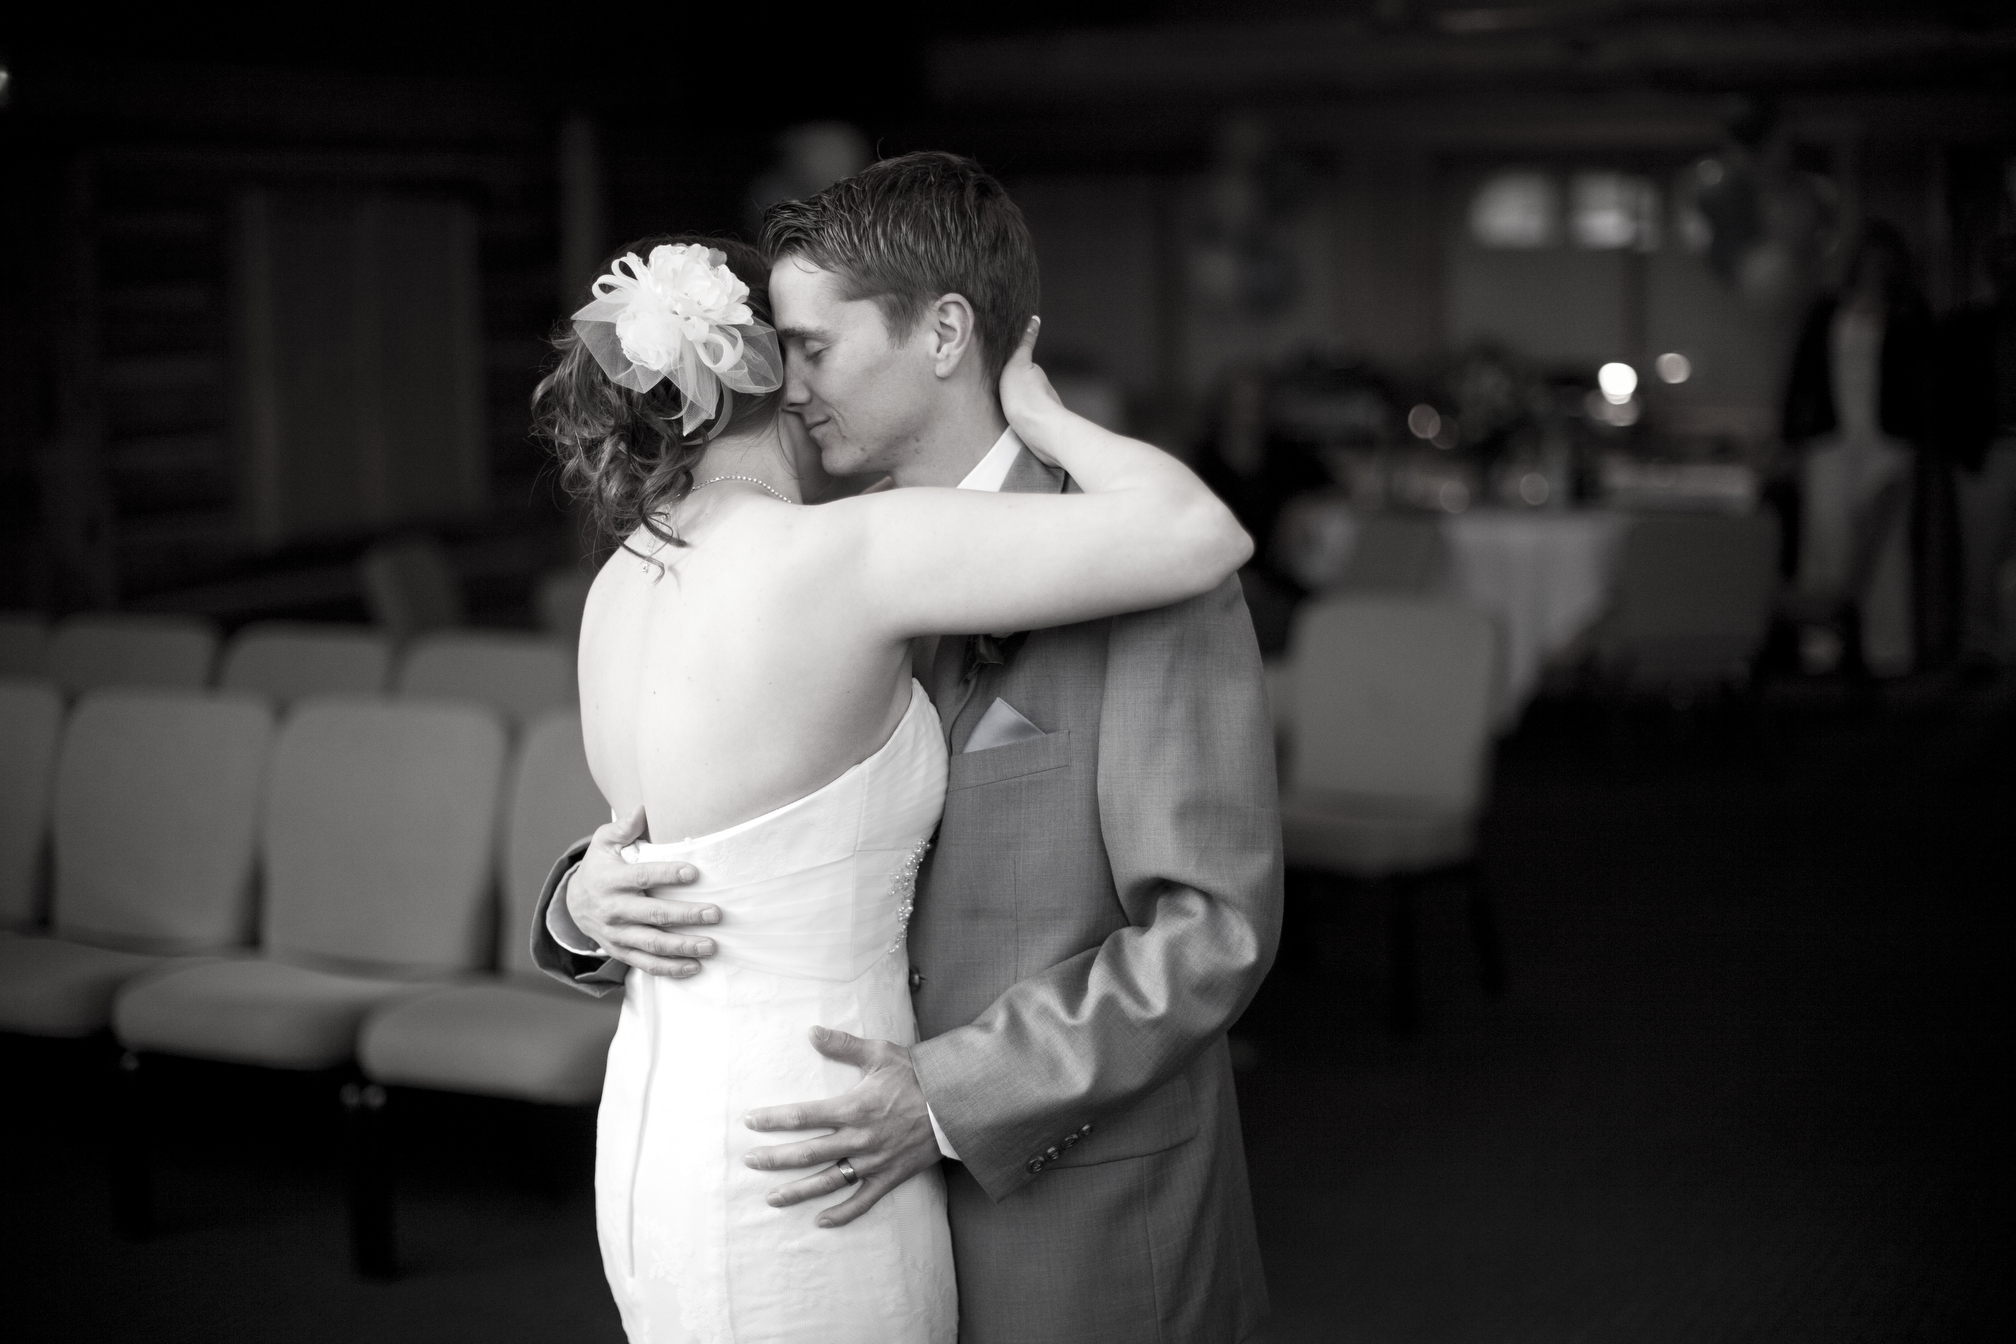 O'Neil Jackson Hole Wedding 2013_0201.JPG